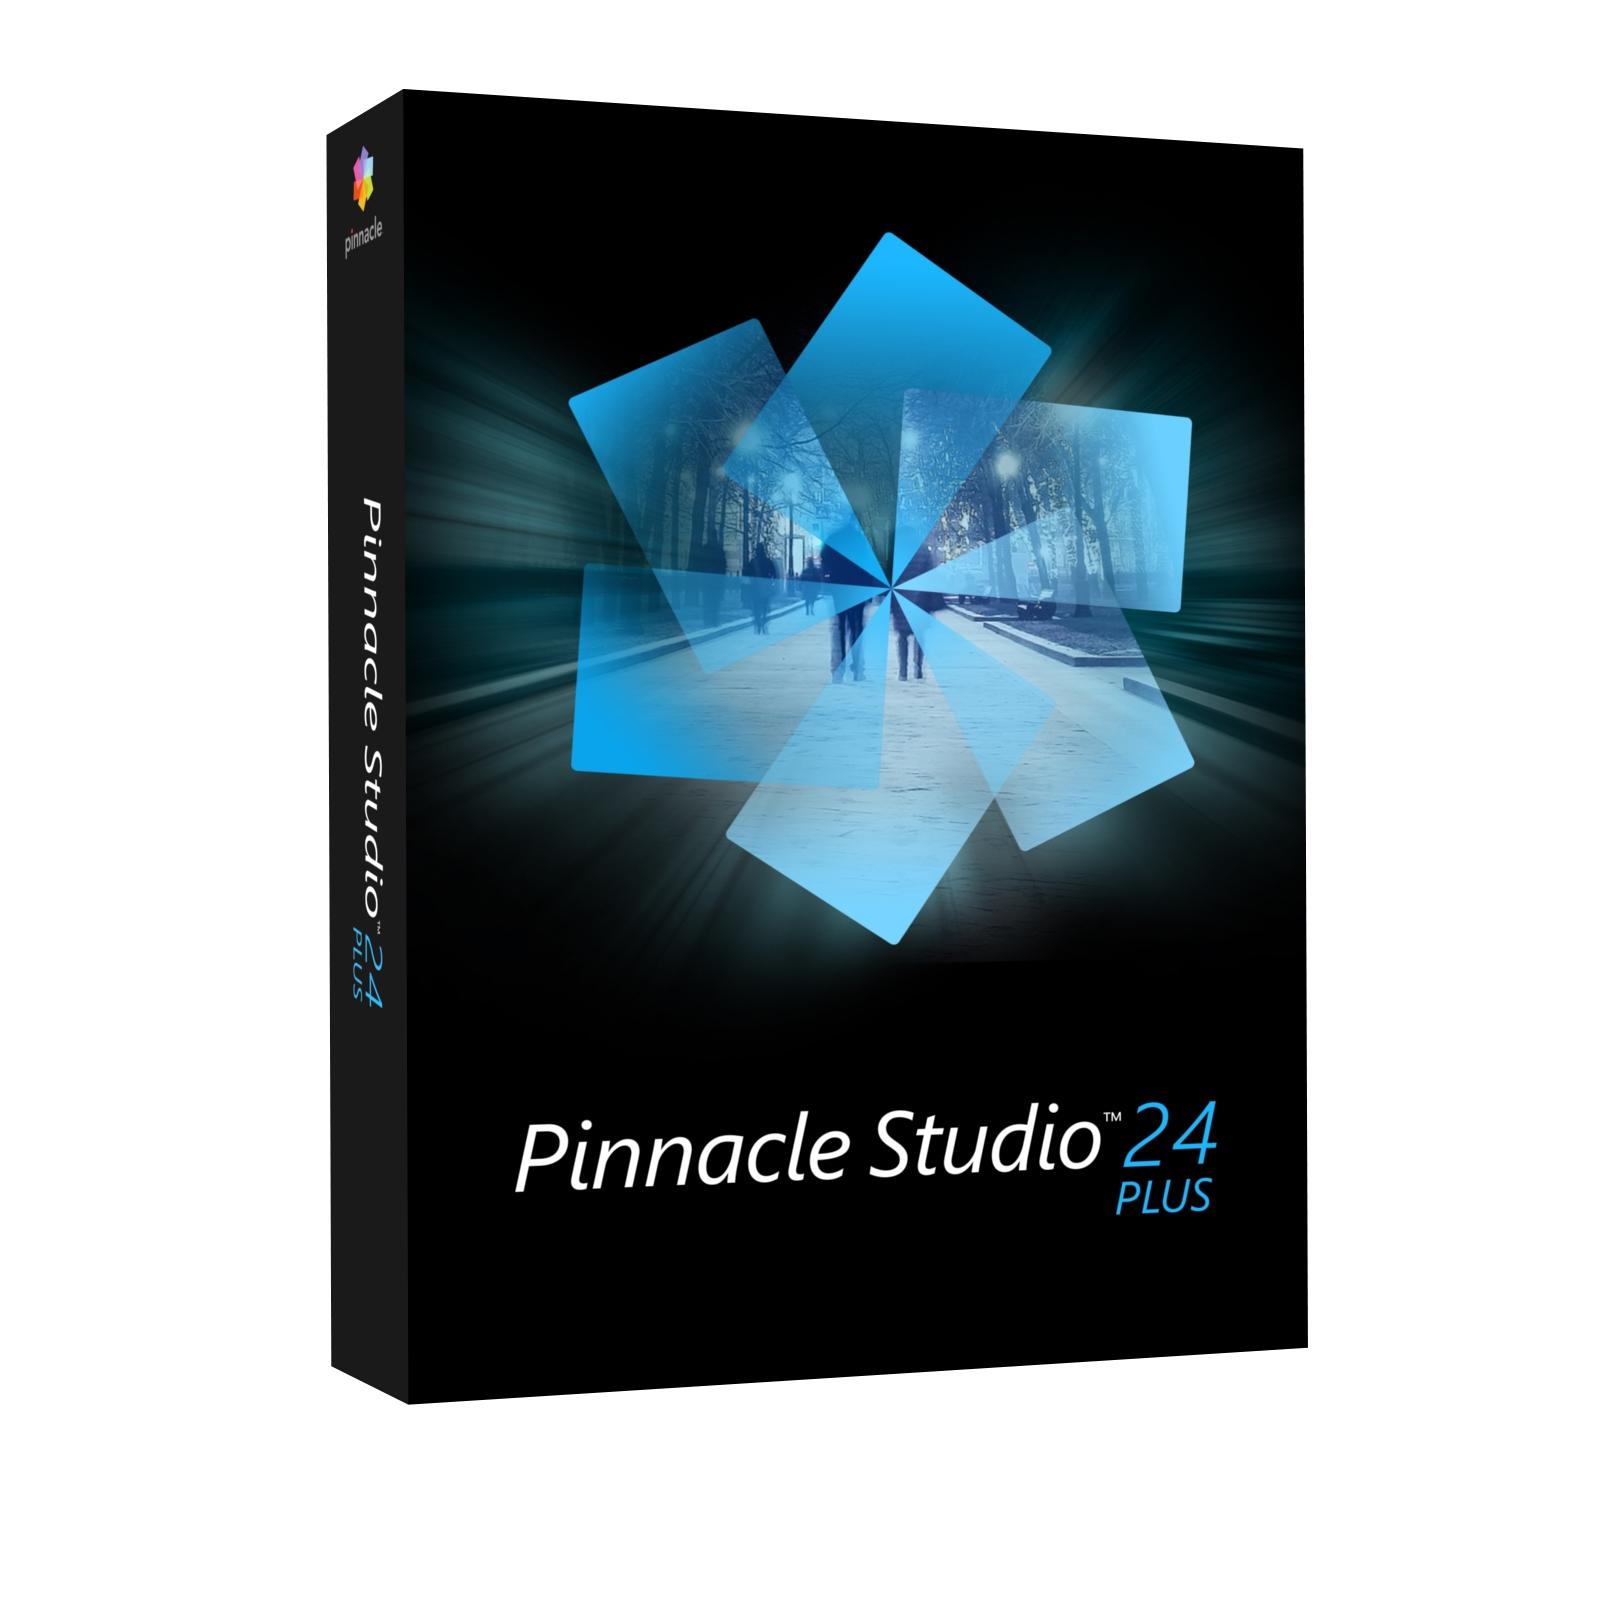 pinnacle-studio-24-plus-rt-generic.jpg